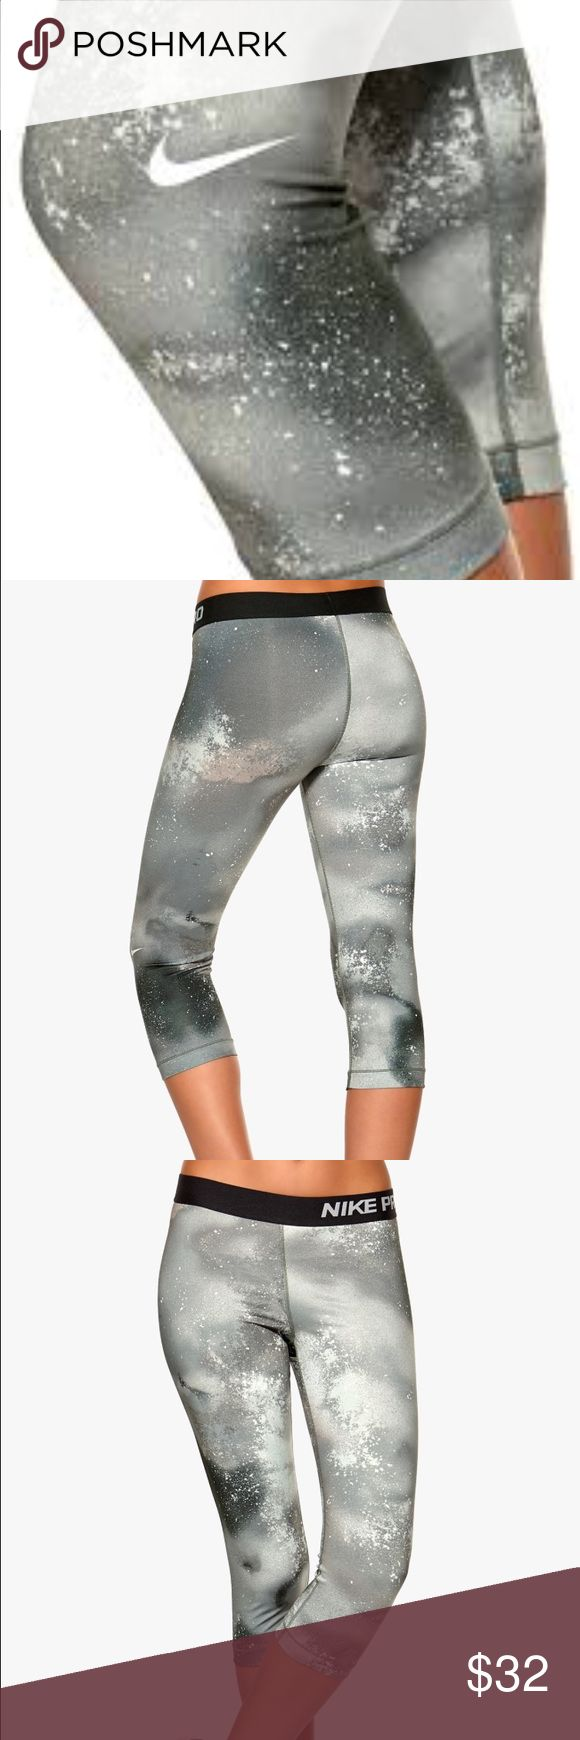 Nike Pro Capri Nike  Pro Fit  Dri Fit Capri  Splatter Print  Size XS  New with tags  Gray/Black Wide Elastic Waist Band  Logo on leg and waist  Polyester/Elastane Nike Pants Capris